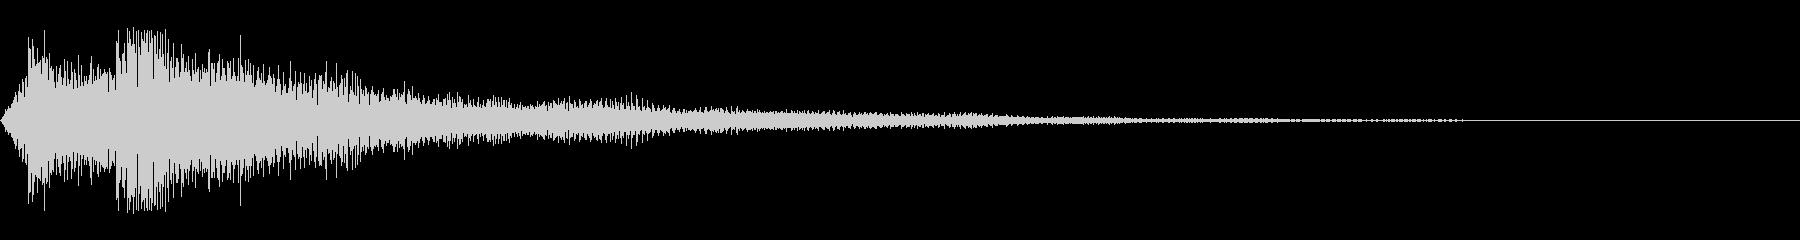 【GAME系】連鎖/パズル/1コンボの未再生の波形